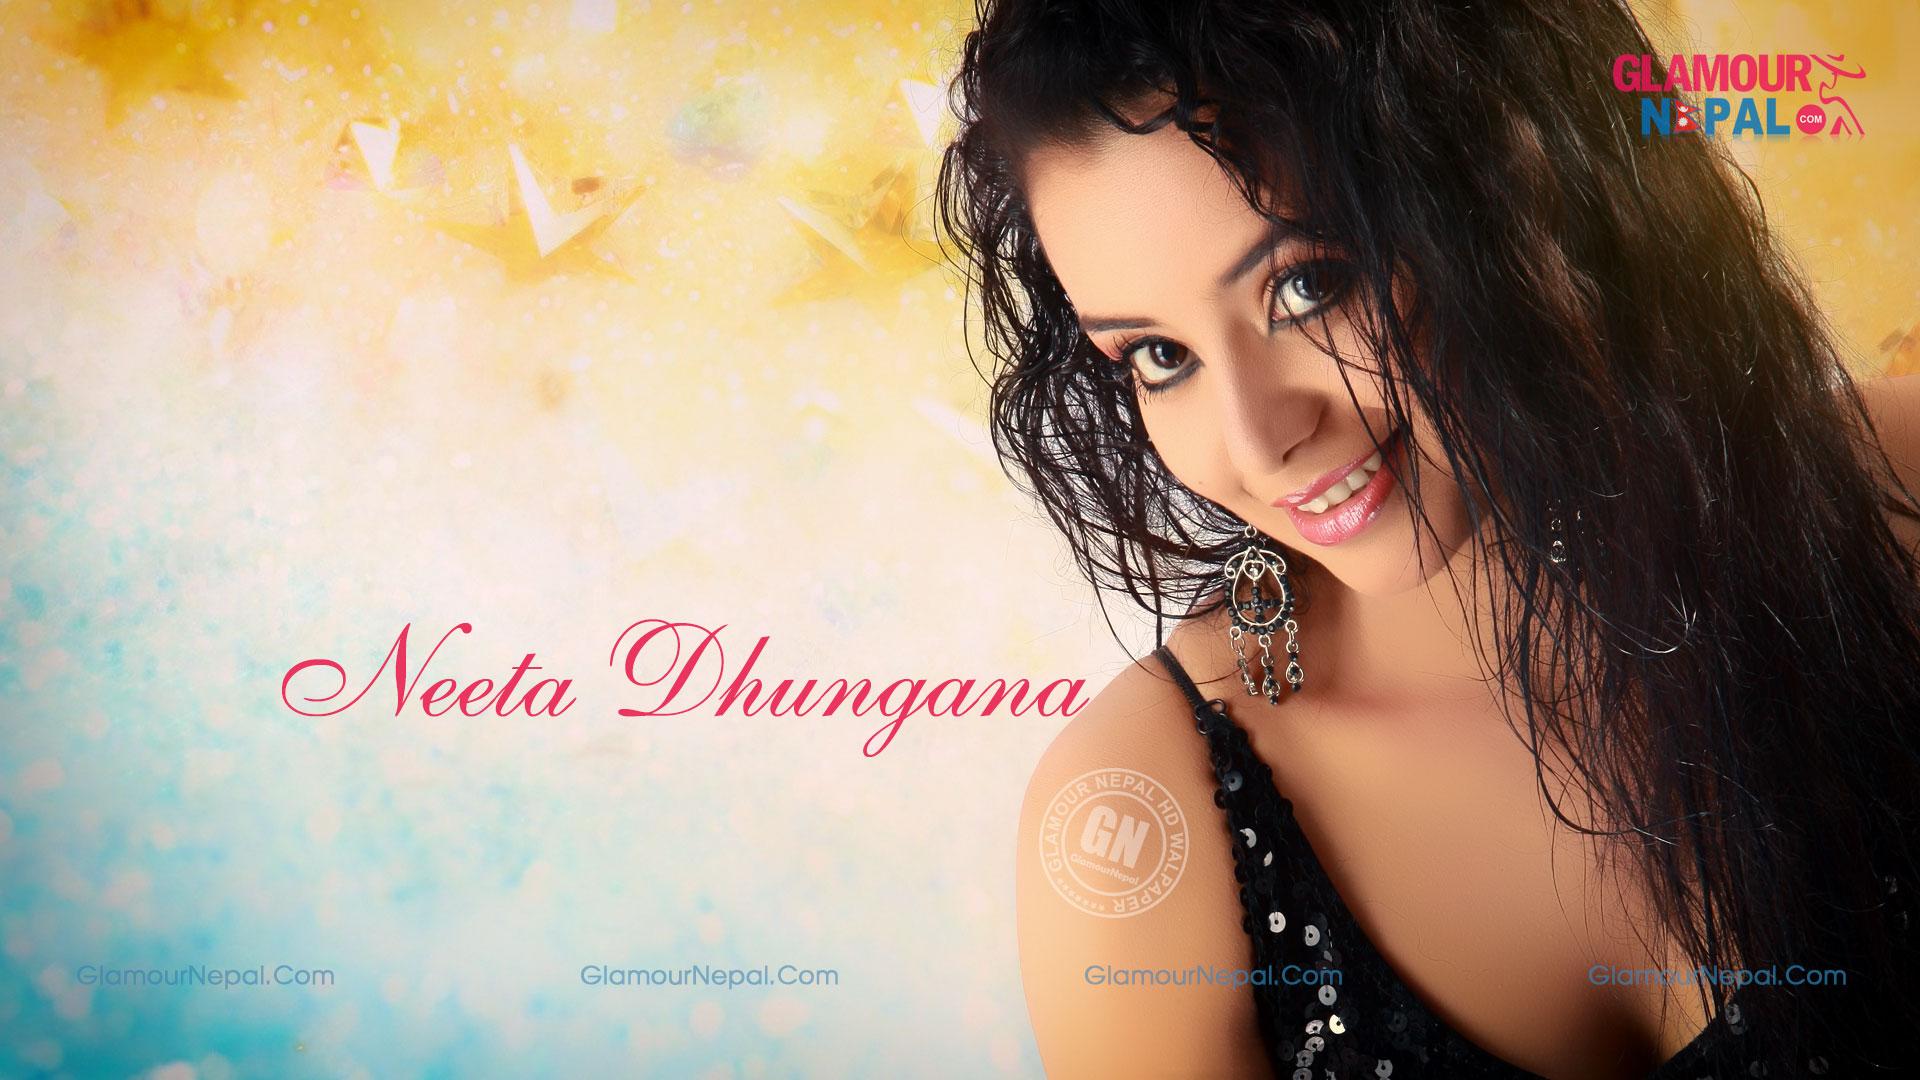 Nepali-Actress-Neeta-Dhungana-HD-Wallpaper-1920x1080-Download